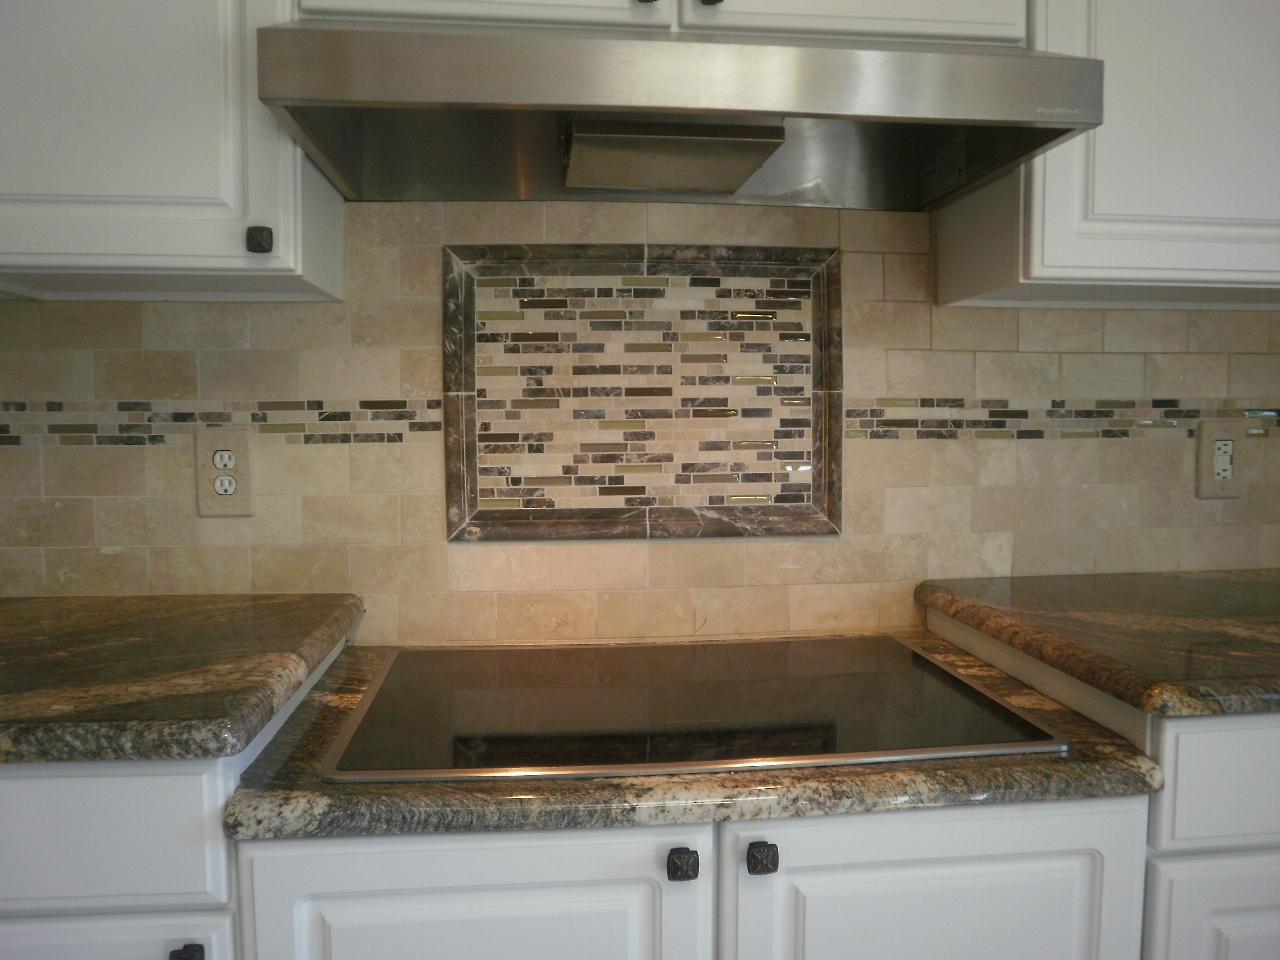 kitchen backsplash ideas for black kitchen tile designs Kitchen Backsplash Ideas For Black Granite Countertops